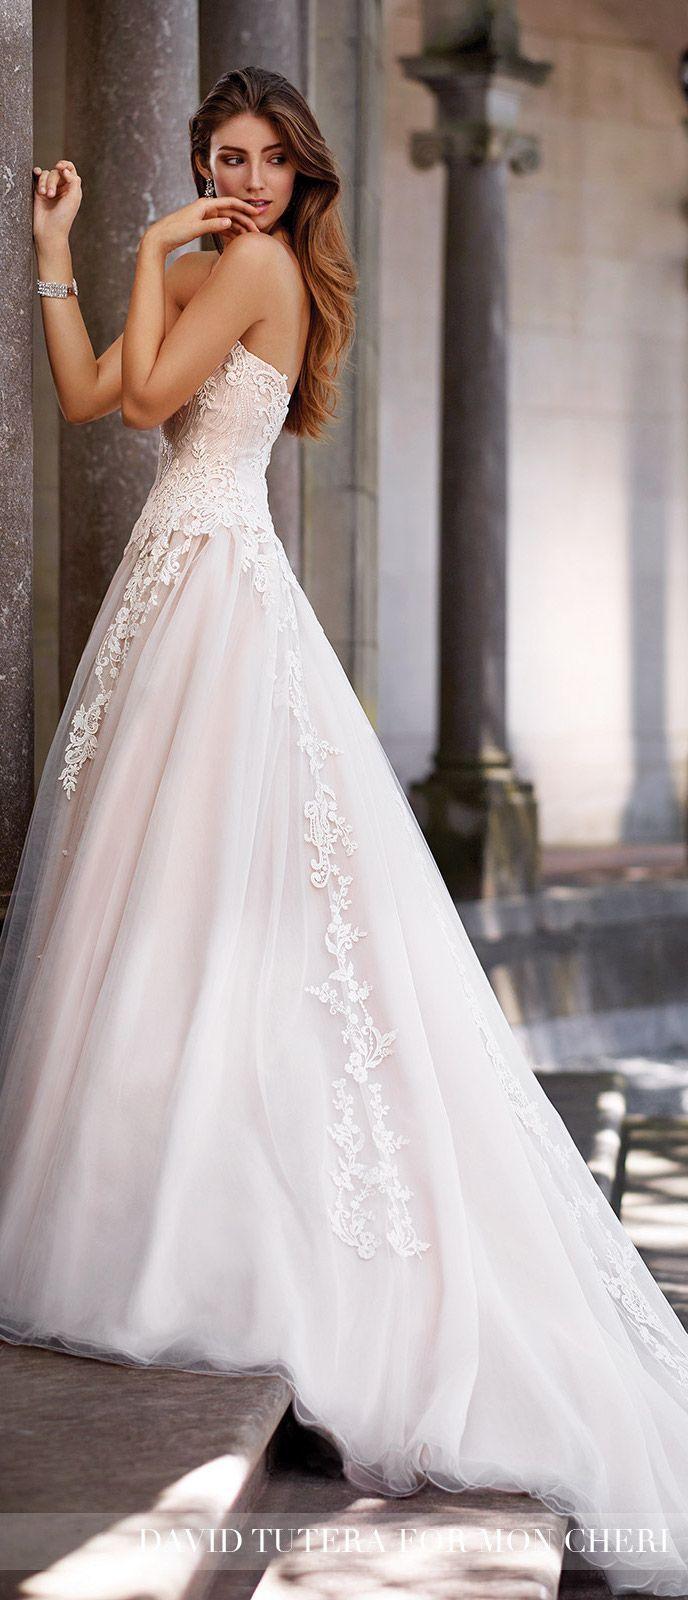 Blush wedding dress by david tutera for mon cheri wedding